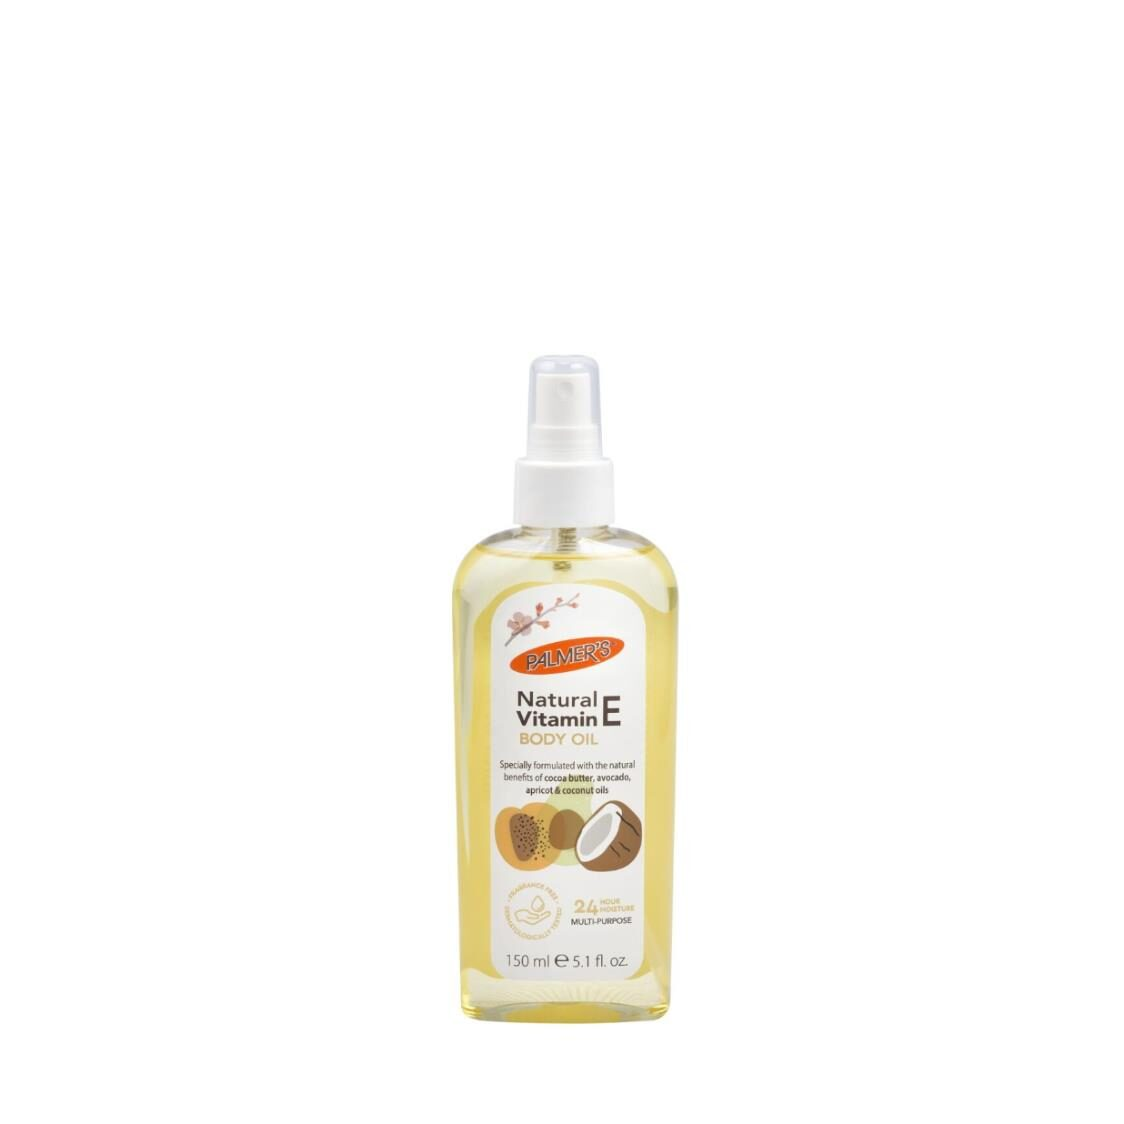 Palmers Natural Vit E Body Oil 150ml